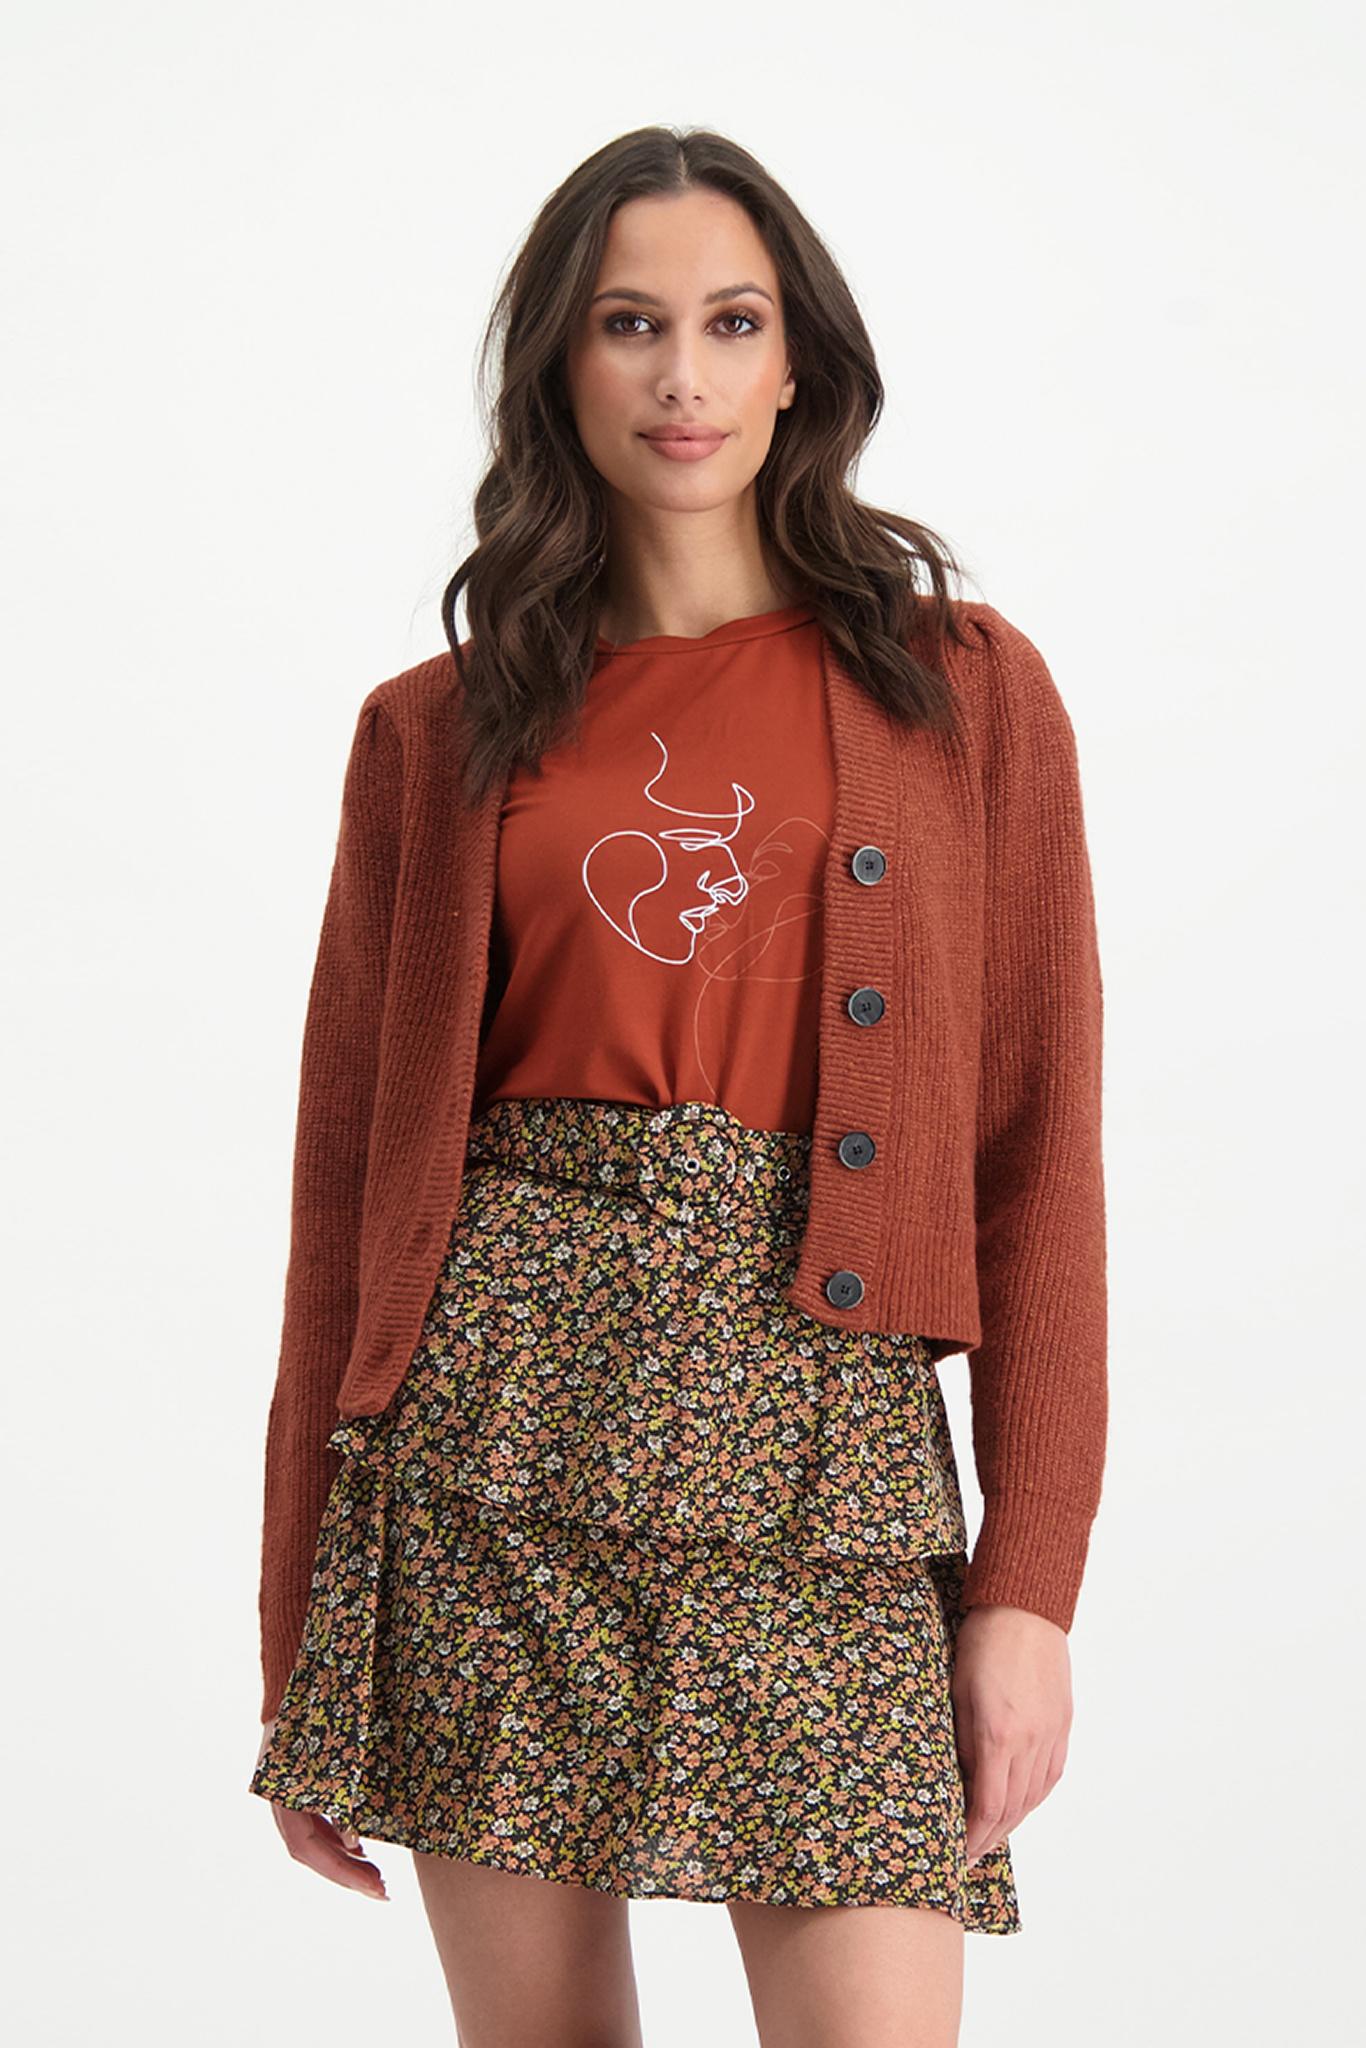 Lofty Manner Orange Knitted Cardigan Daphne